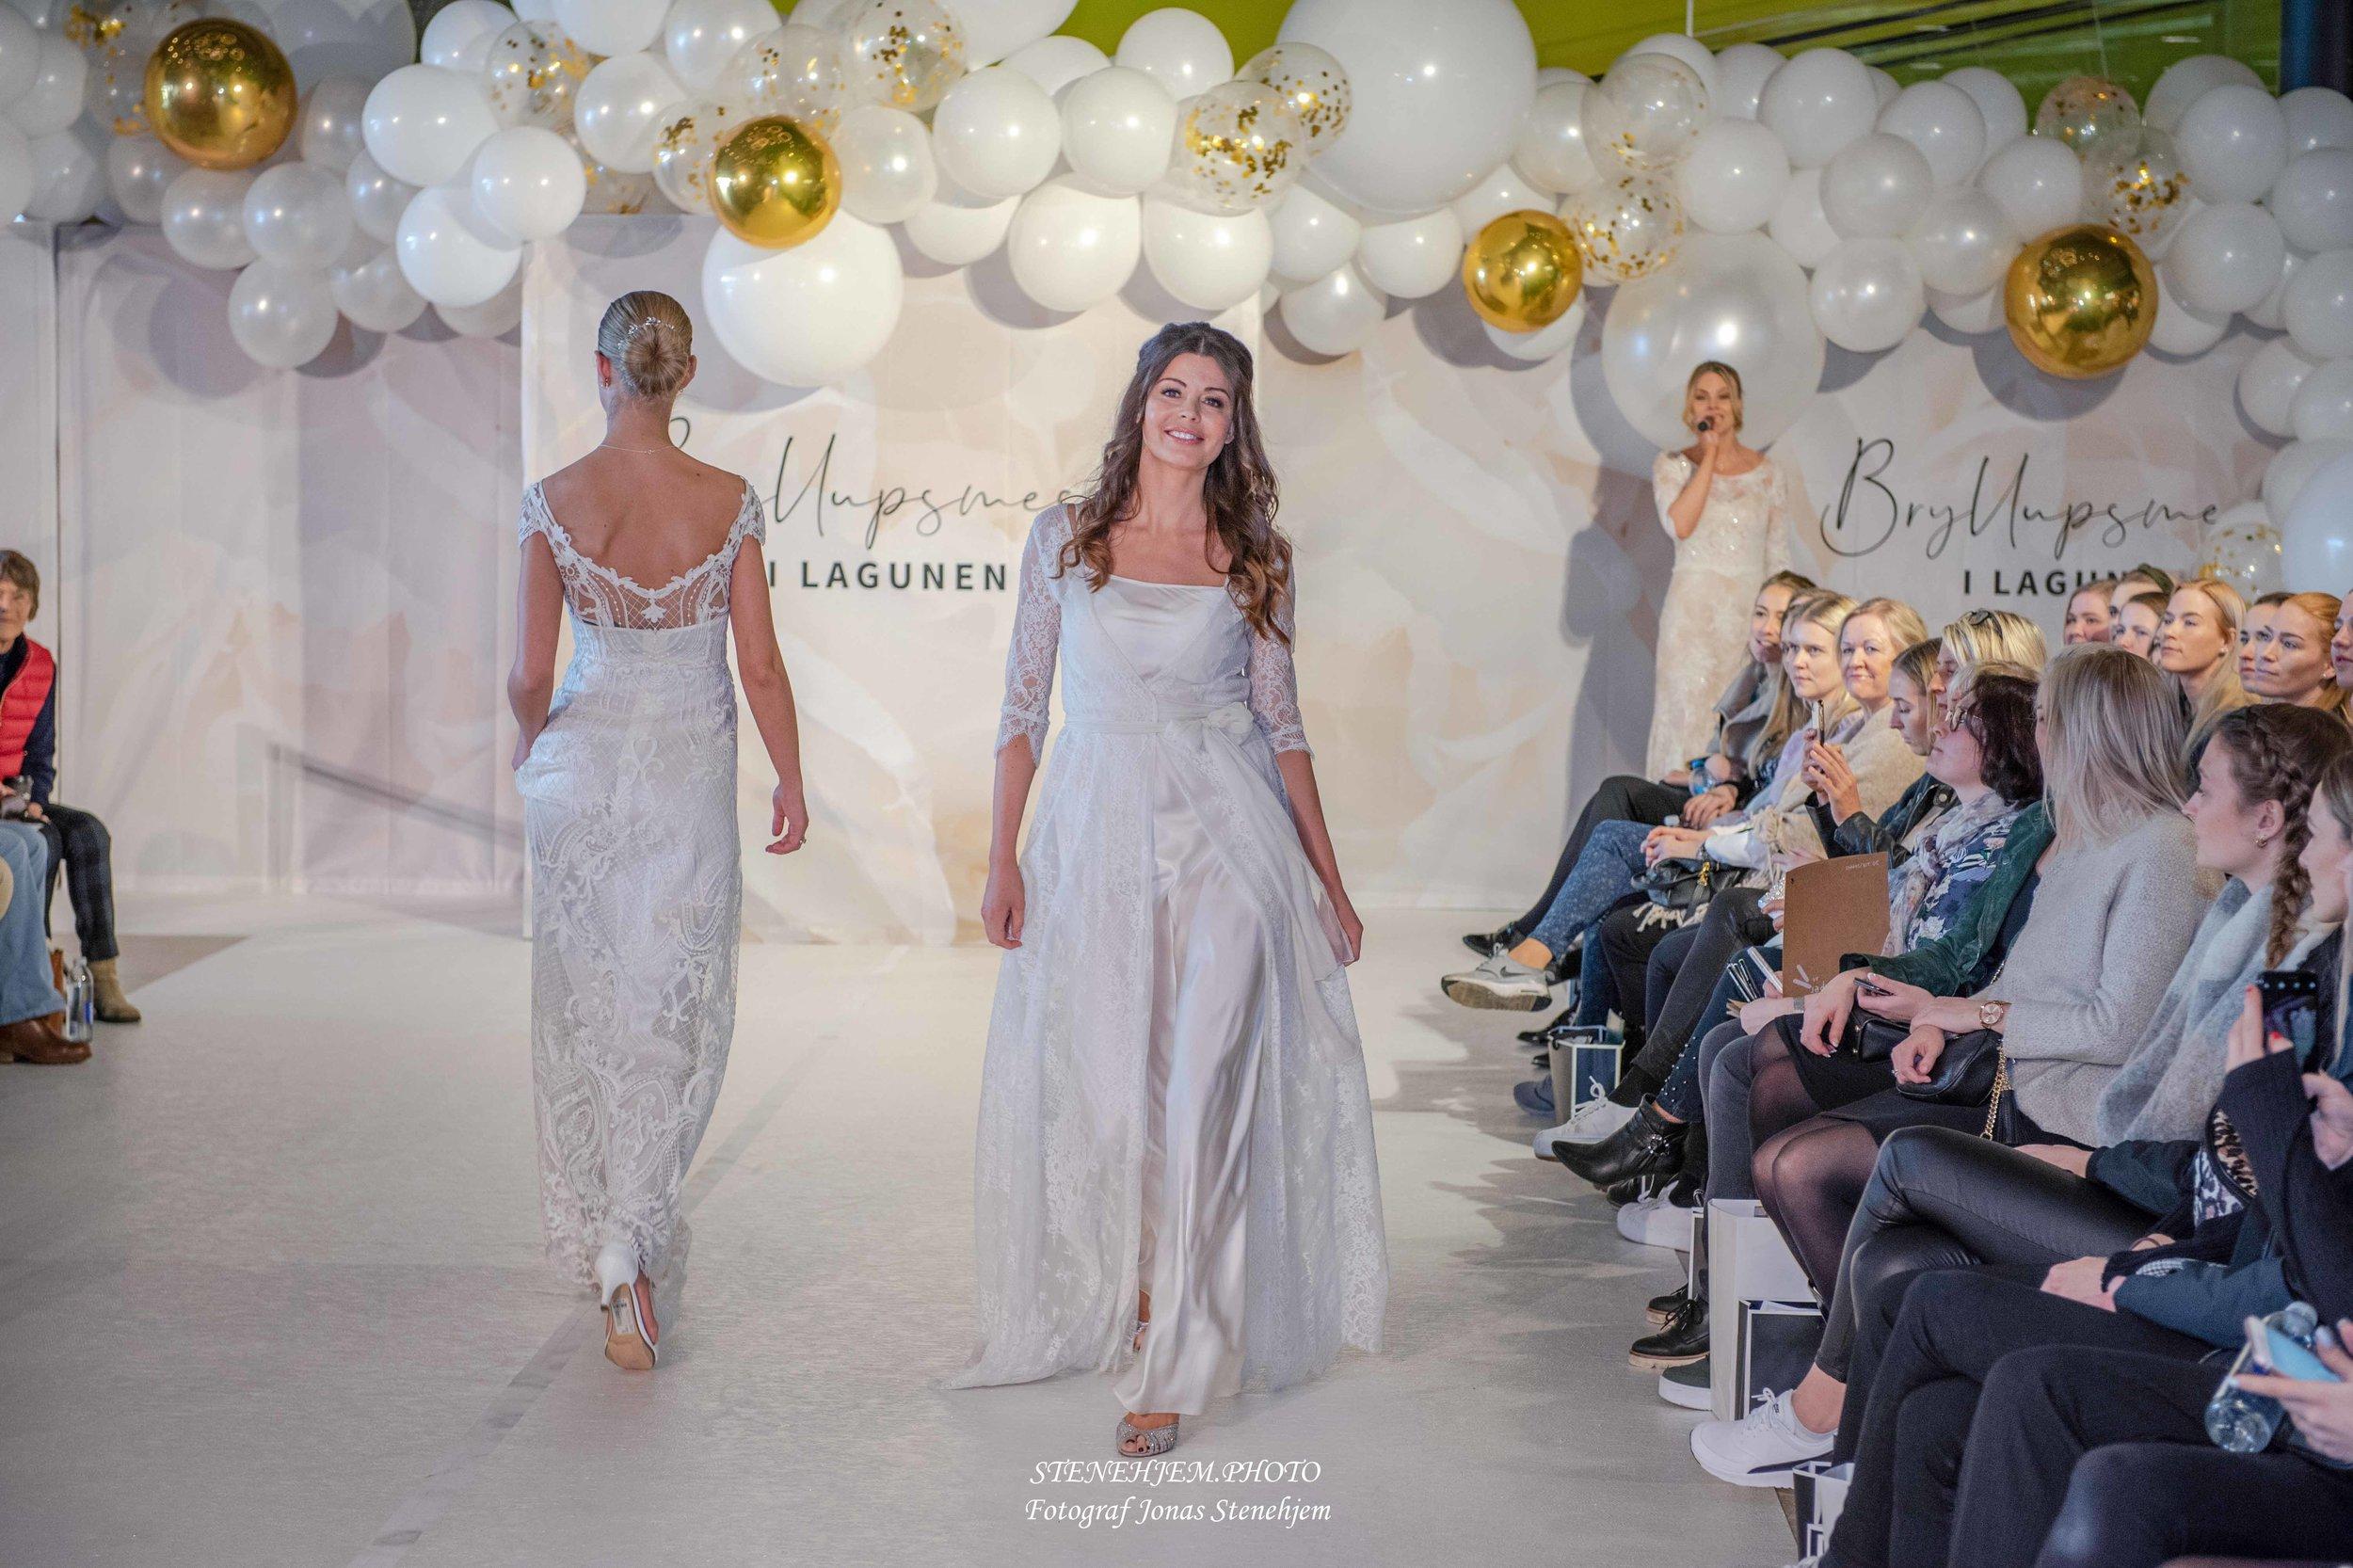 Bryllupsmesse_Lagunen_mittaltweddingfair__021.jpg